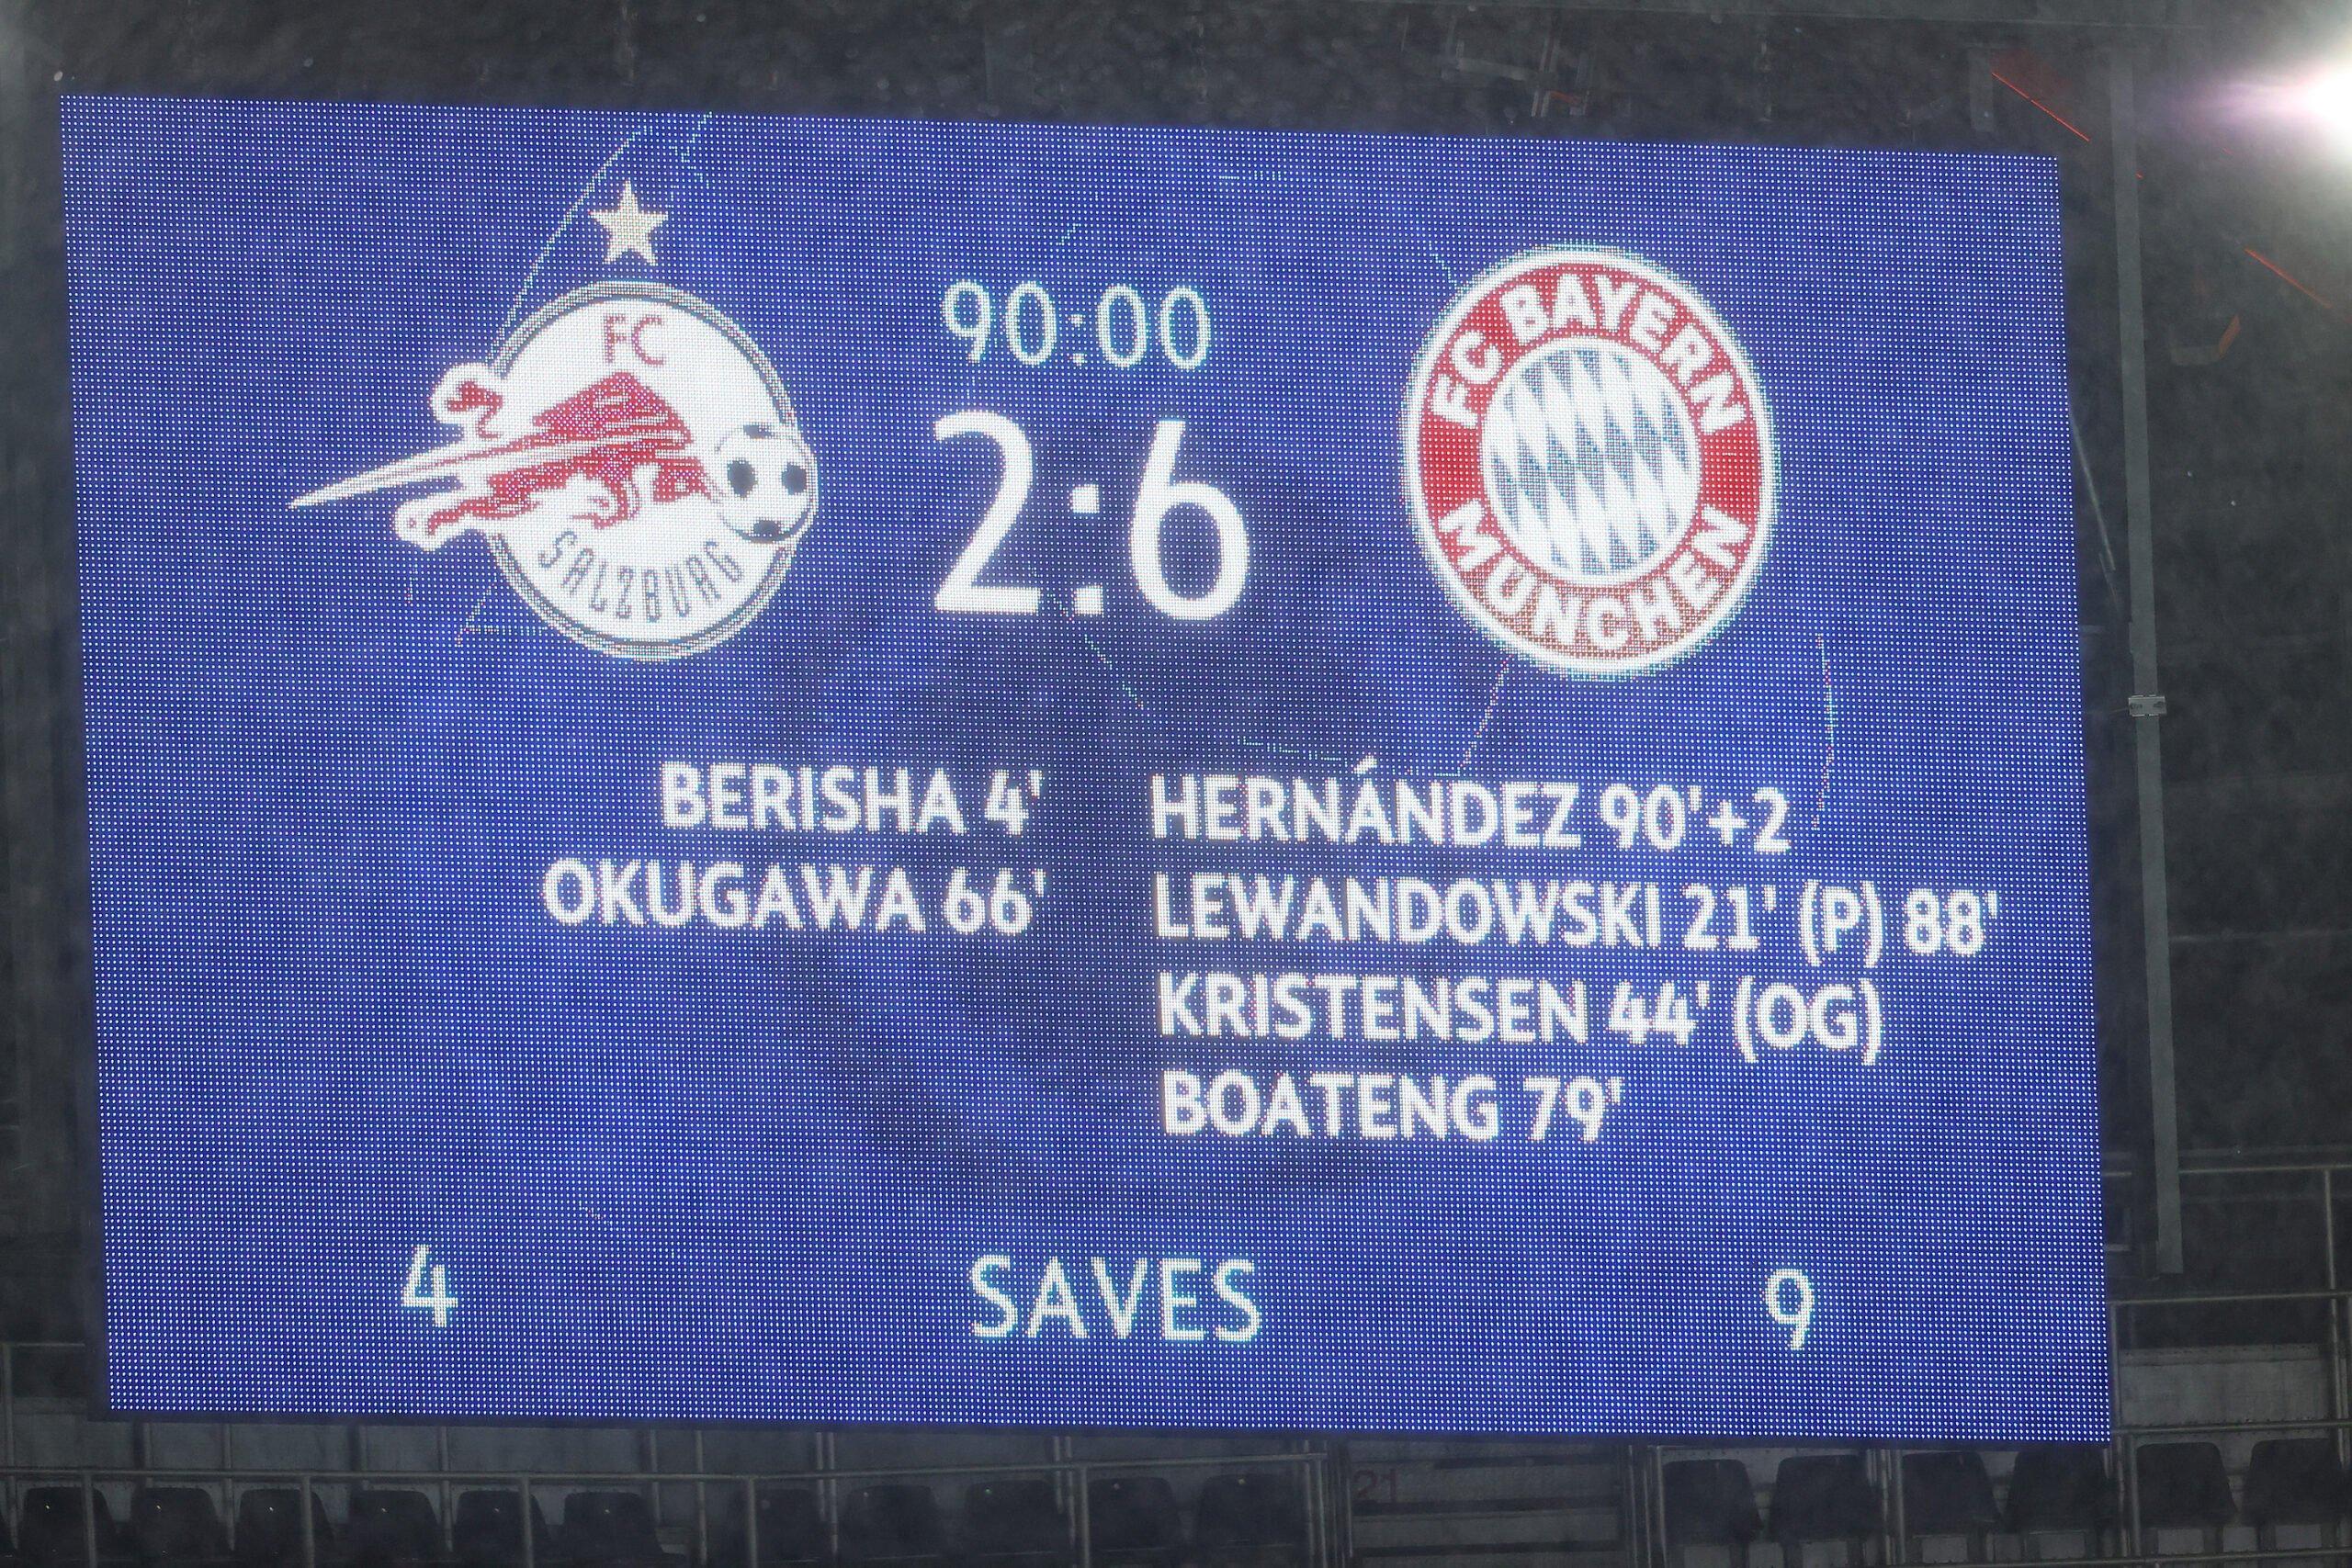 RB Salzburg vs. FC Bayern